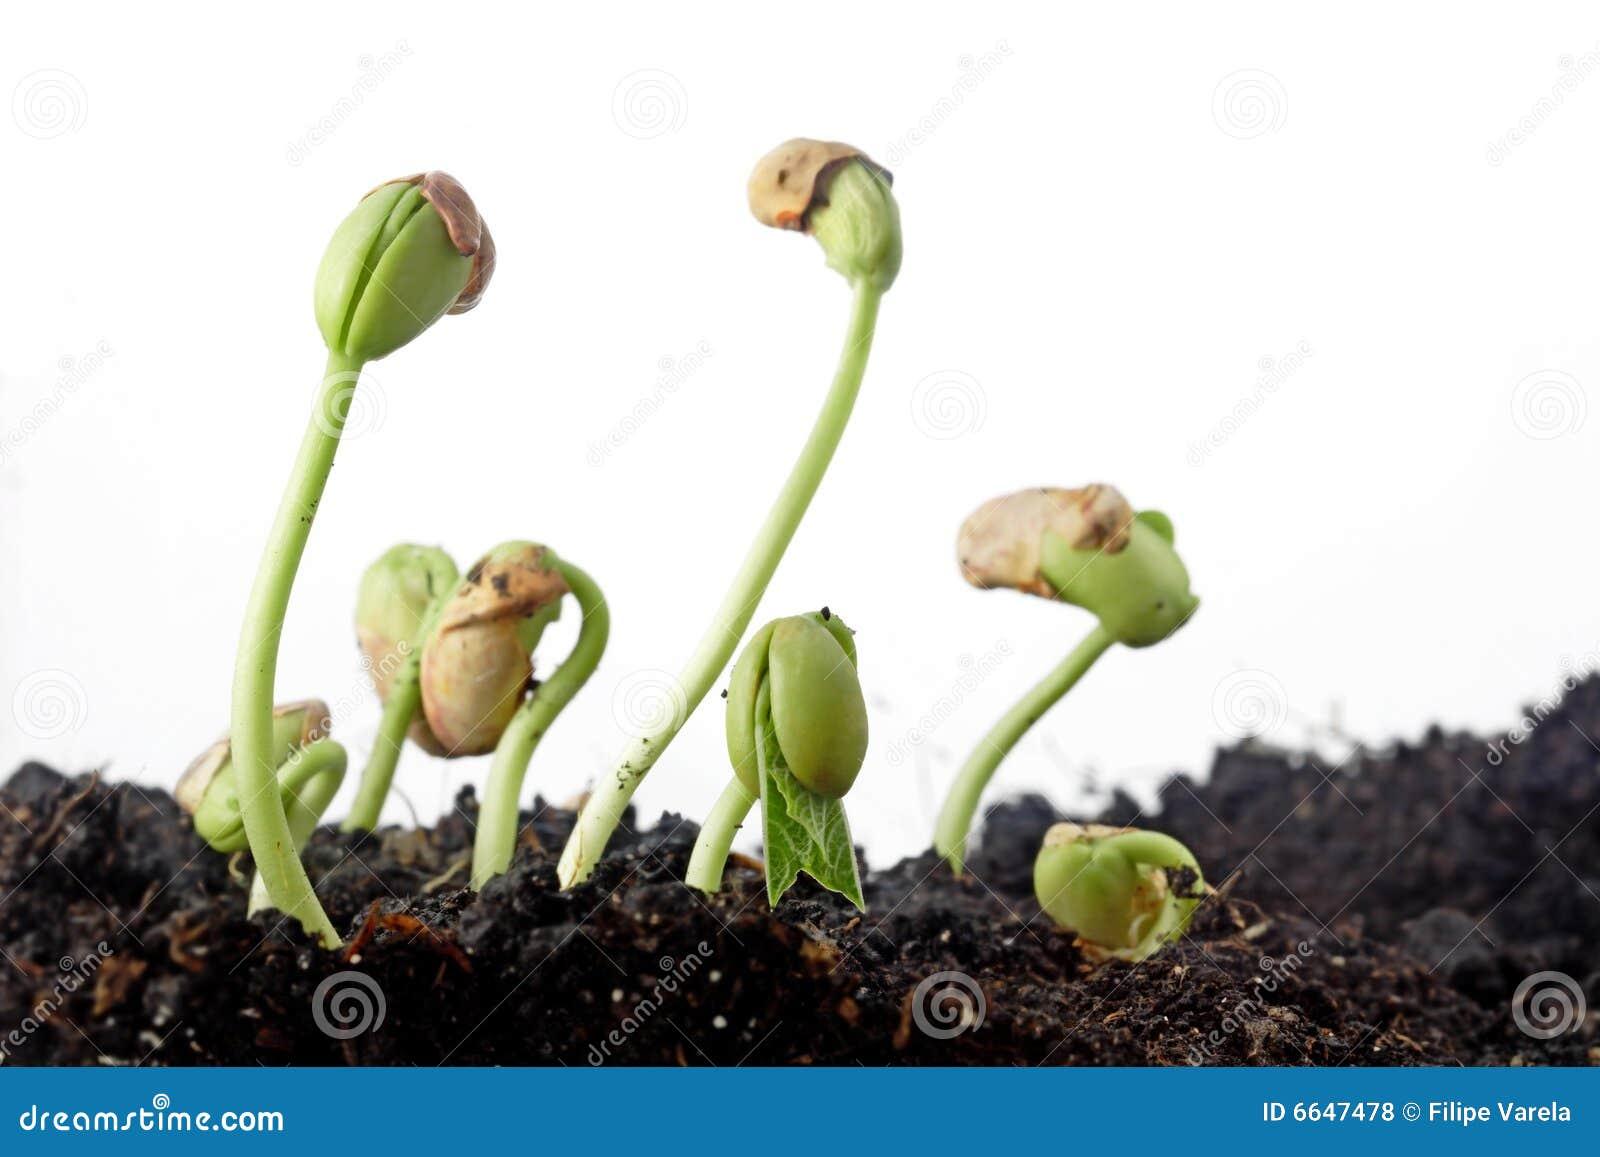 Bean Seeds Germination Royalty Free Stock Photos - Image: 6647478: www.dreamstime.com/royalty-free-stock-photos-bean-seeds-germination...